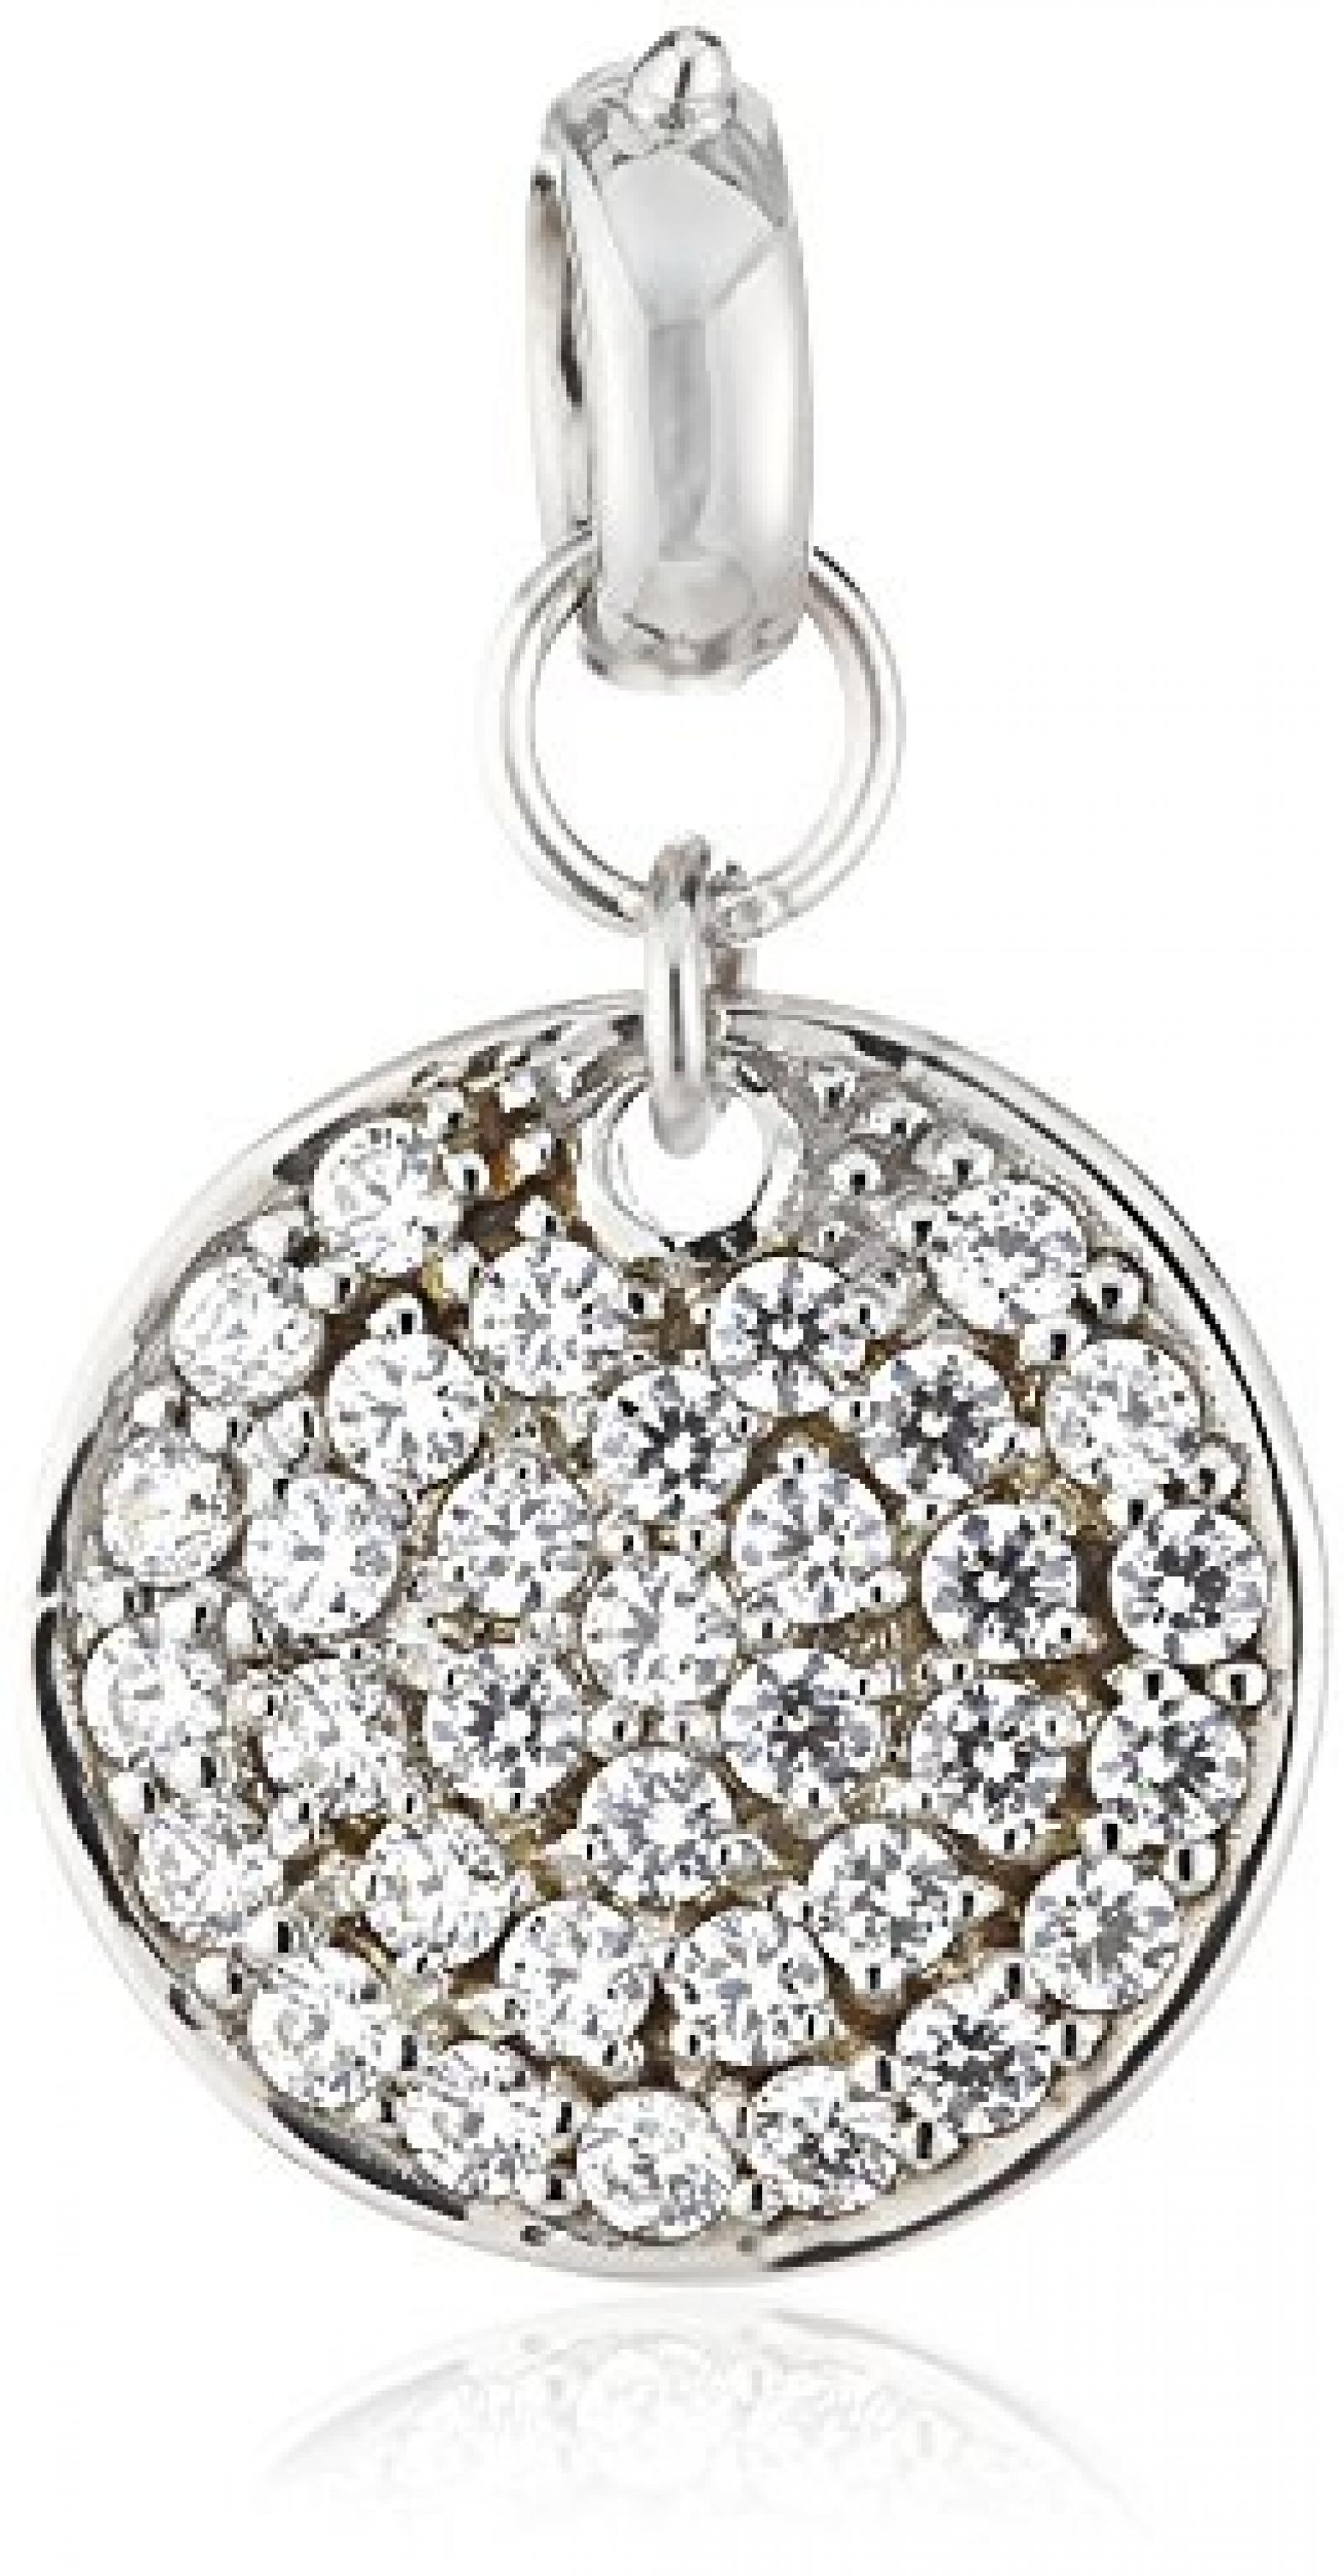 Celesta Damen-Charmsanhänger 925 Sterling Silber Zirkonia weiß 273240734L-1